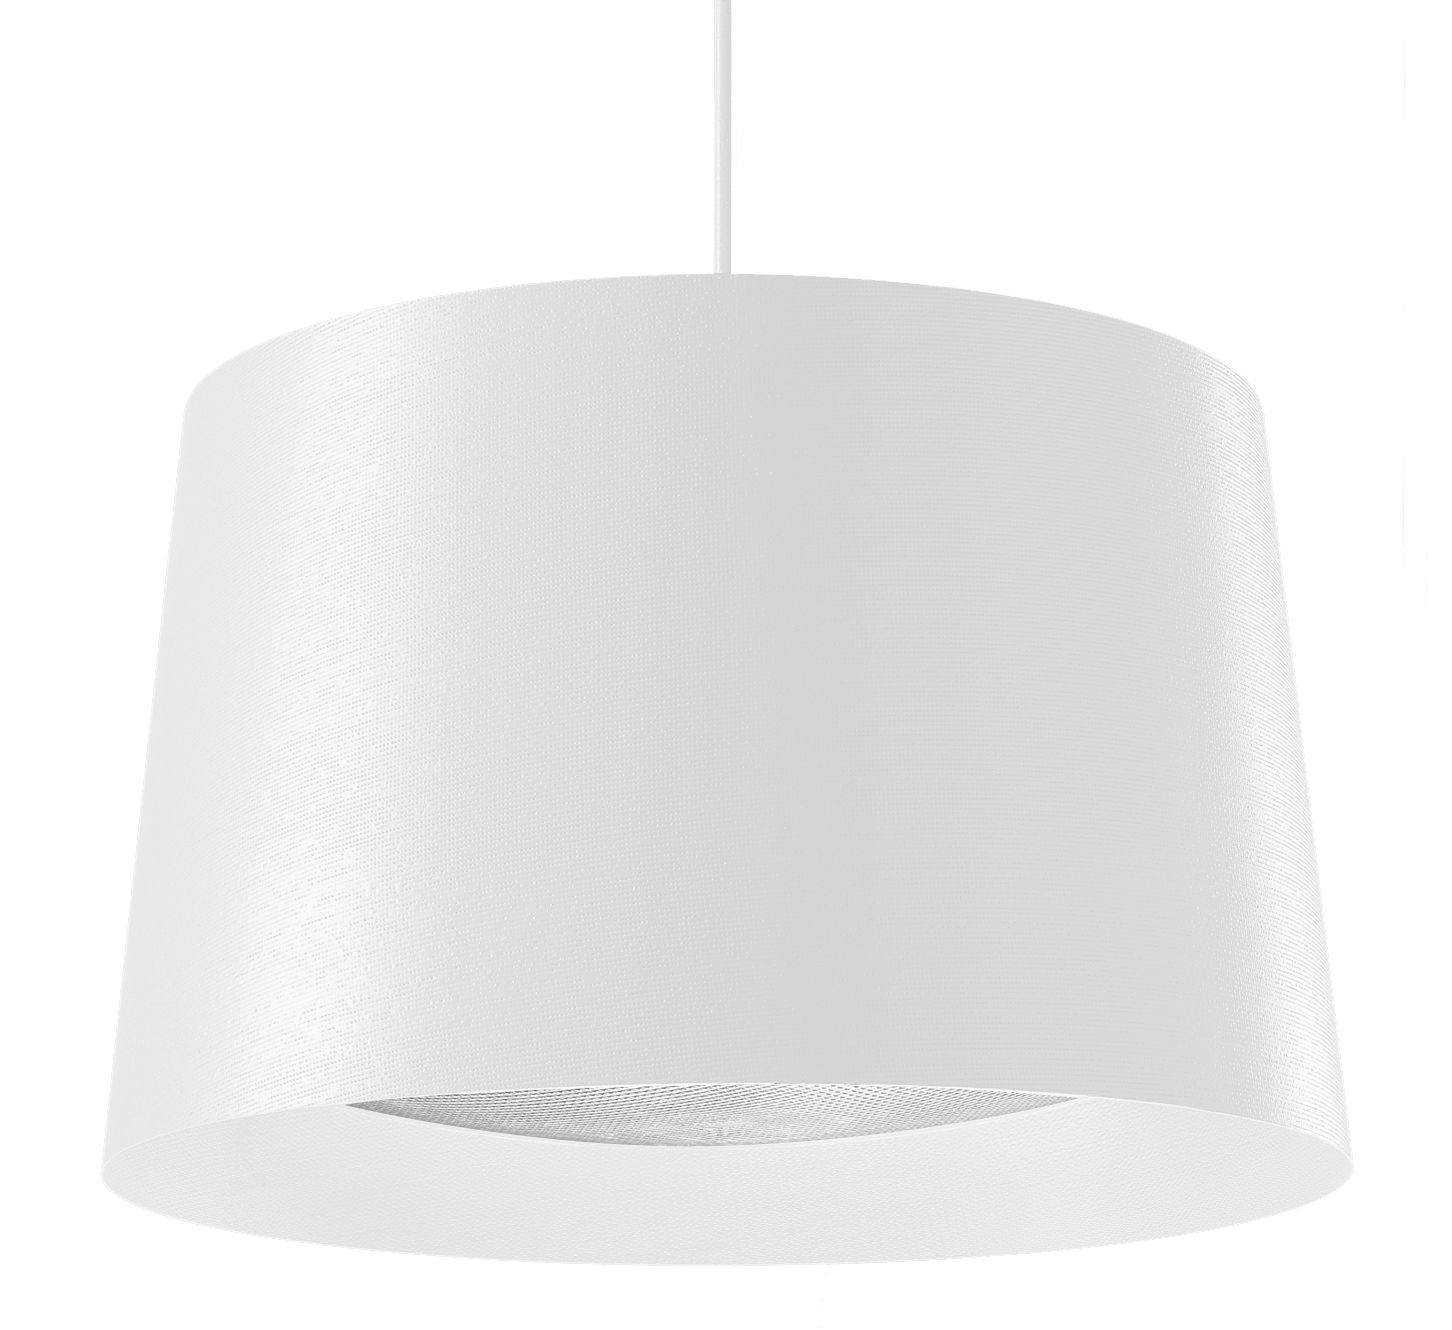 Luminaire - Suspensions - Suspension Twiggy Large / Ø 46 x H 29 cm - Foscarini - Blanc - Fibre de verre, Matériau composite